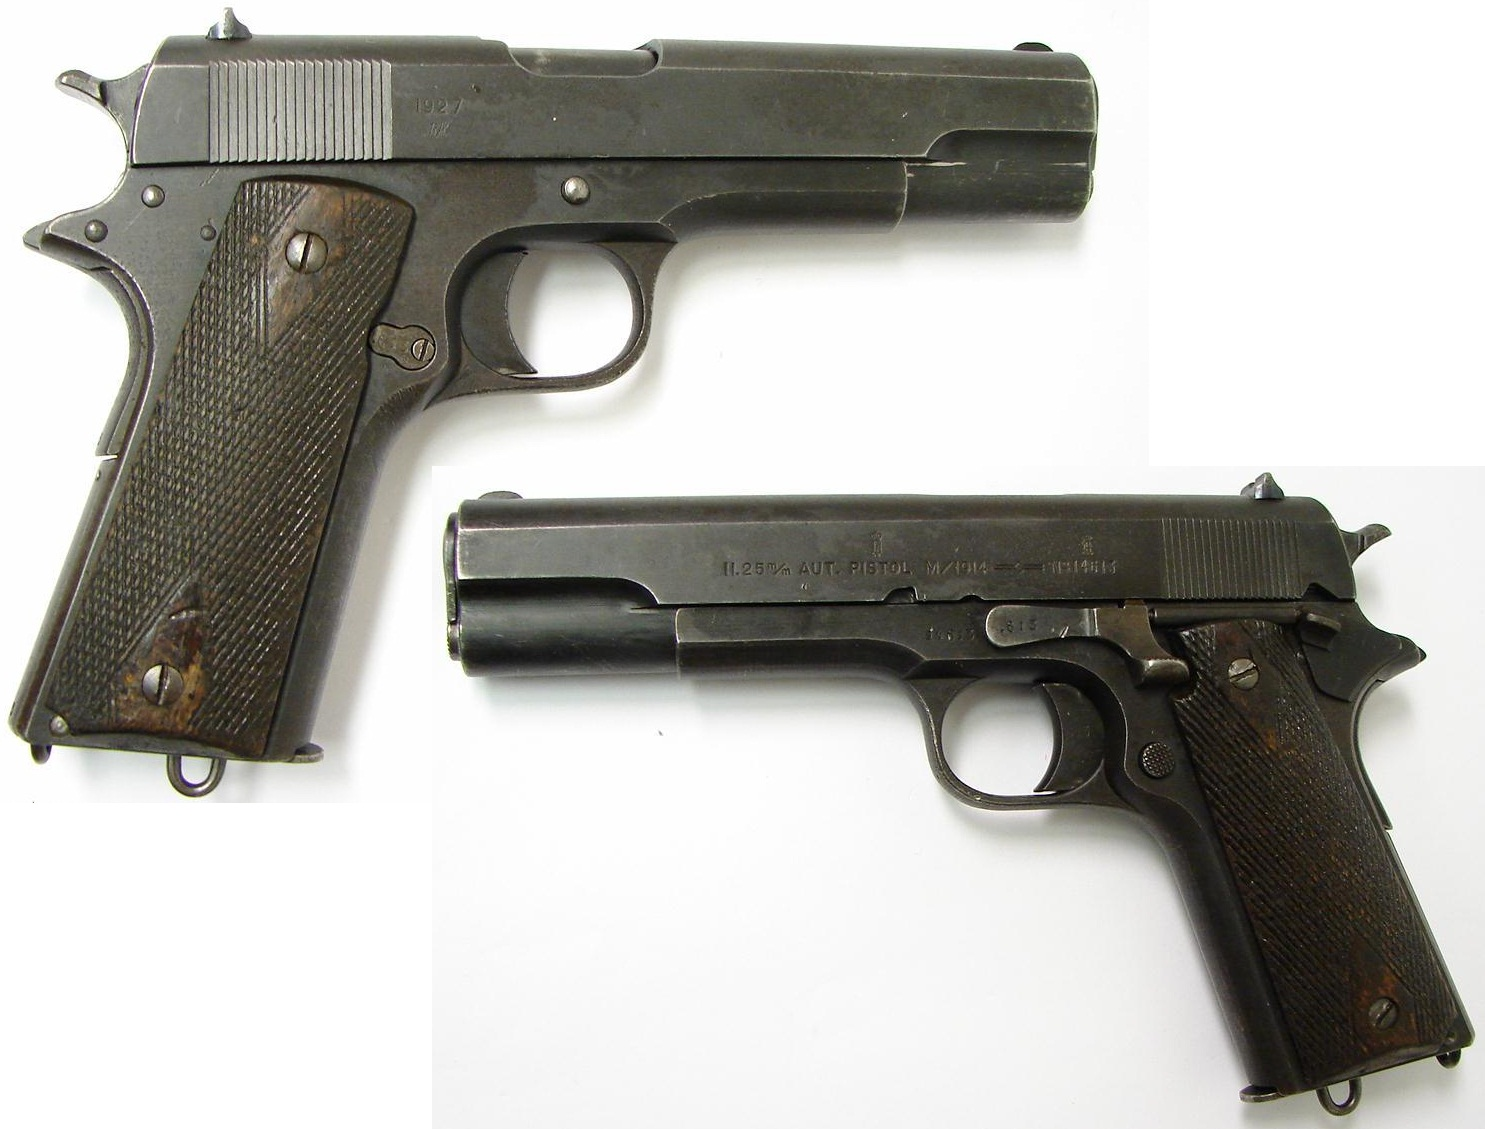 M/1914, Kongsberg Colt